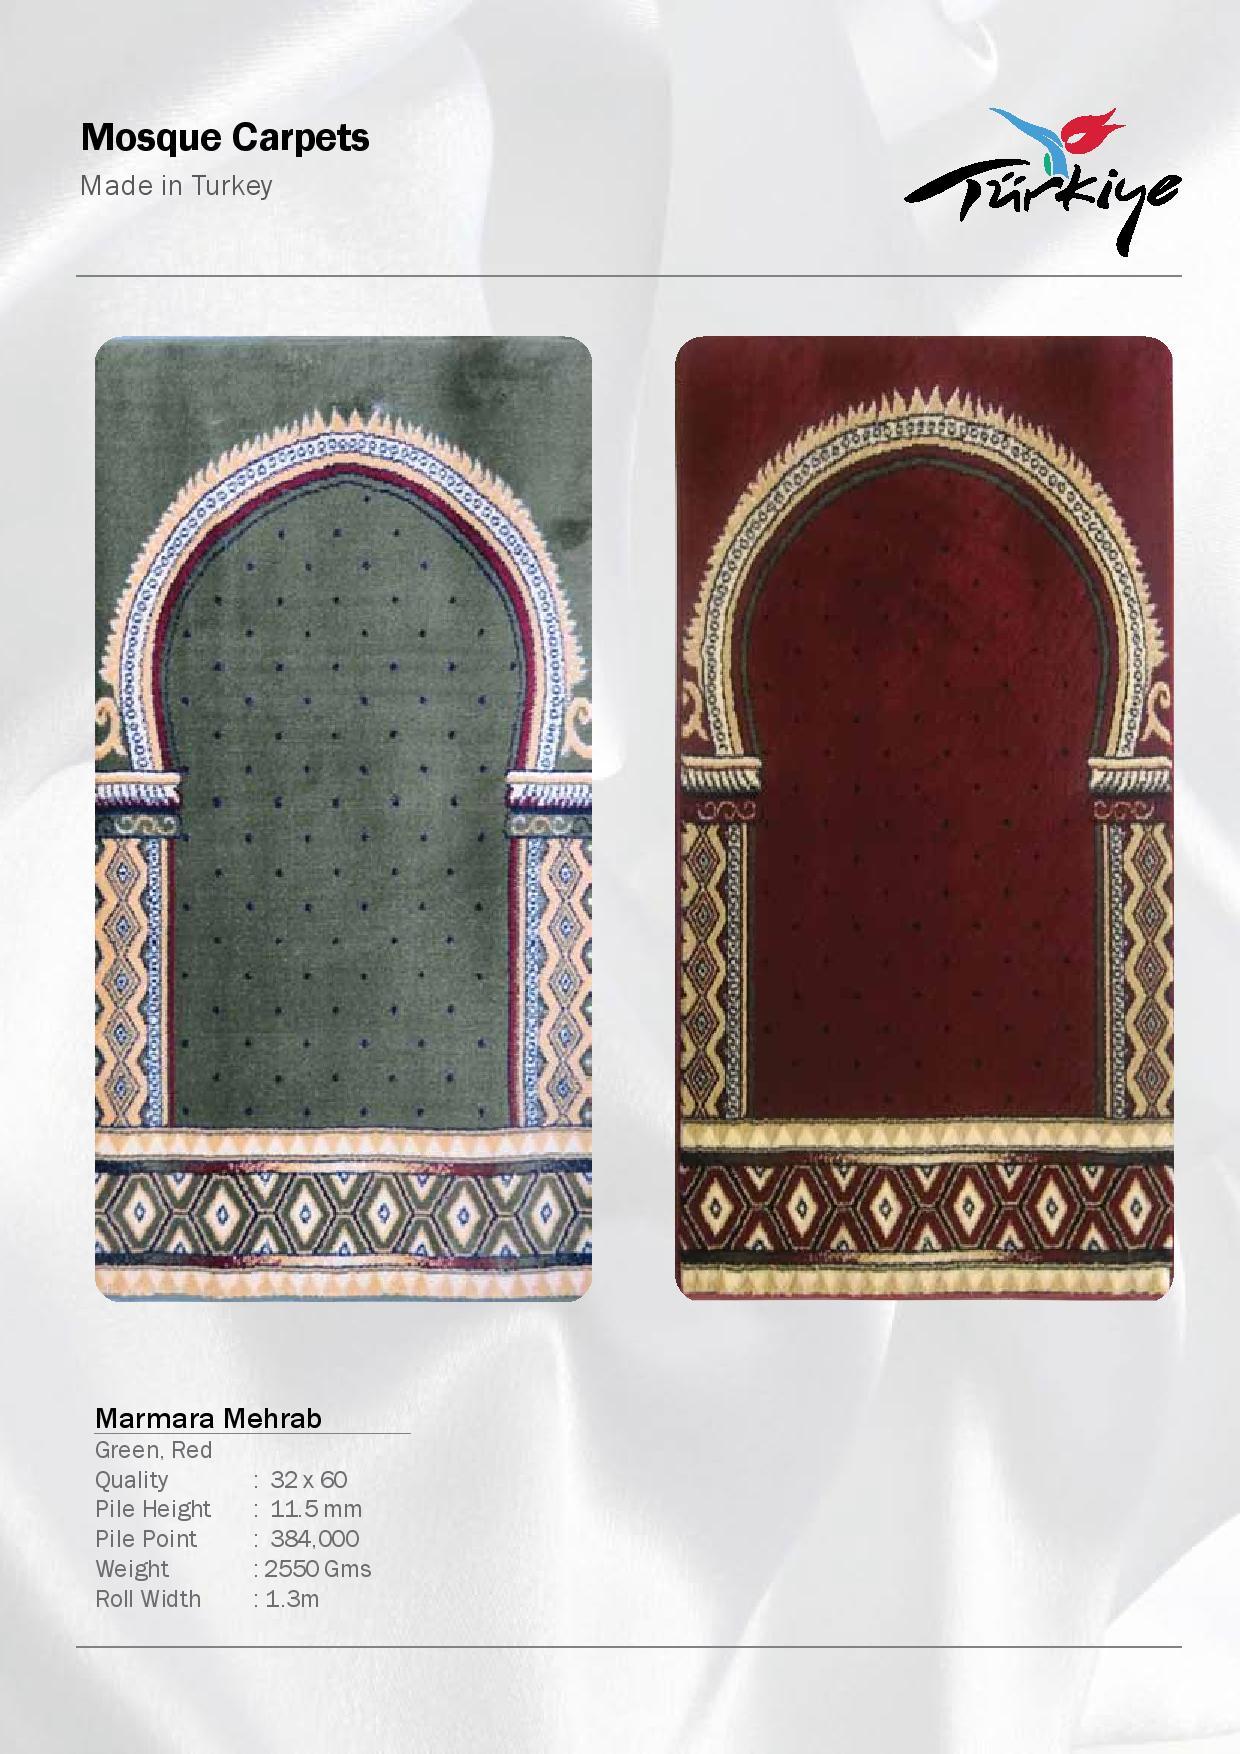 Mosque-Carpets-Marmara Mehrab